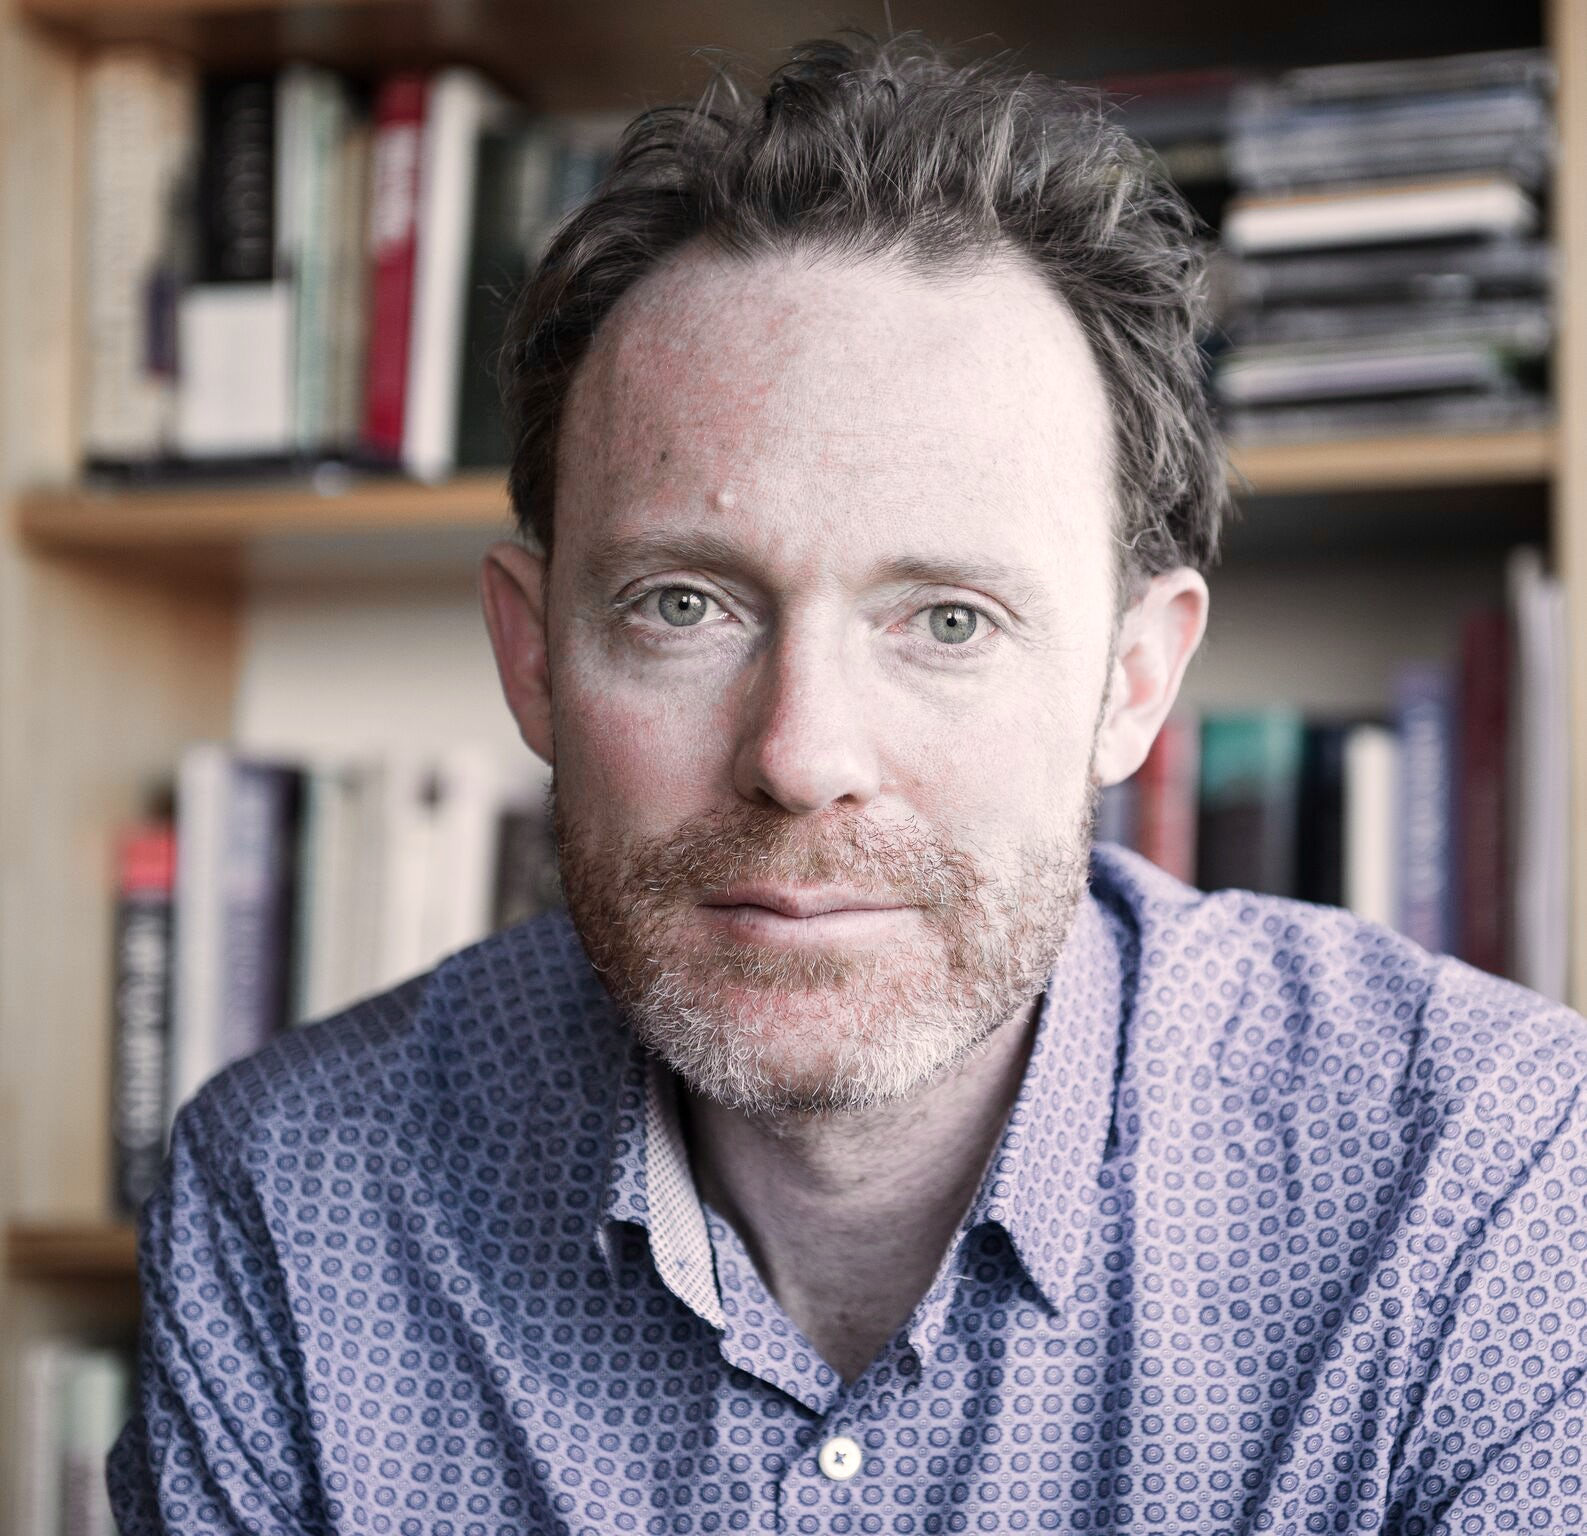 Matthew White